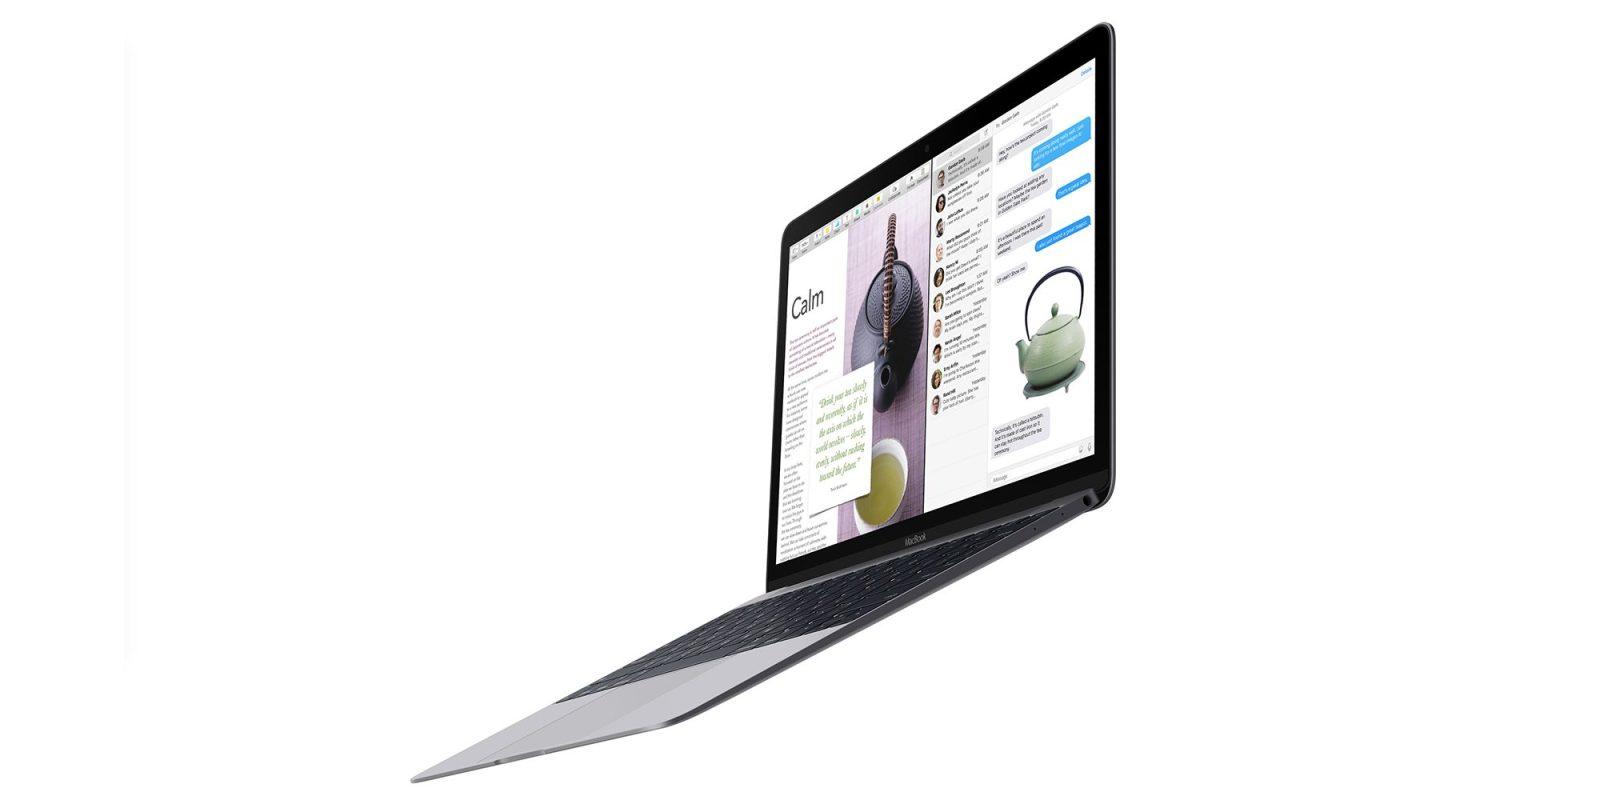 Apple's 12-inch MacBook is on sale, plus Anker deals, more